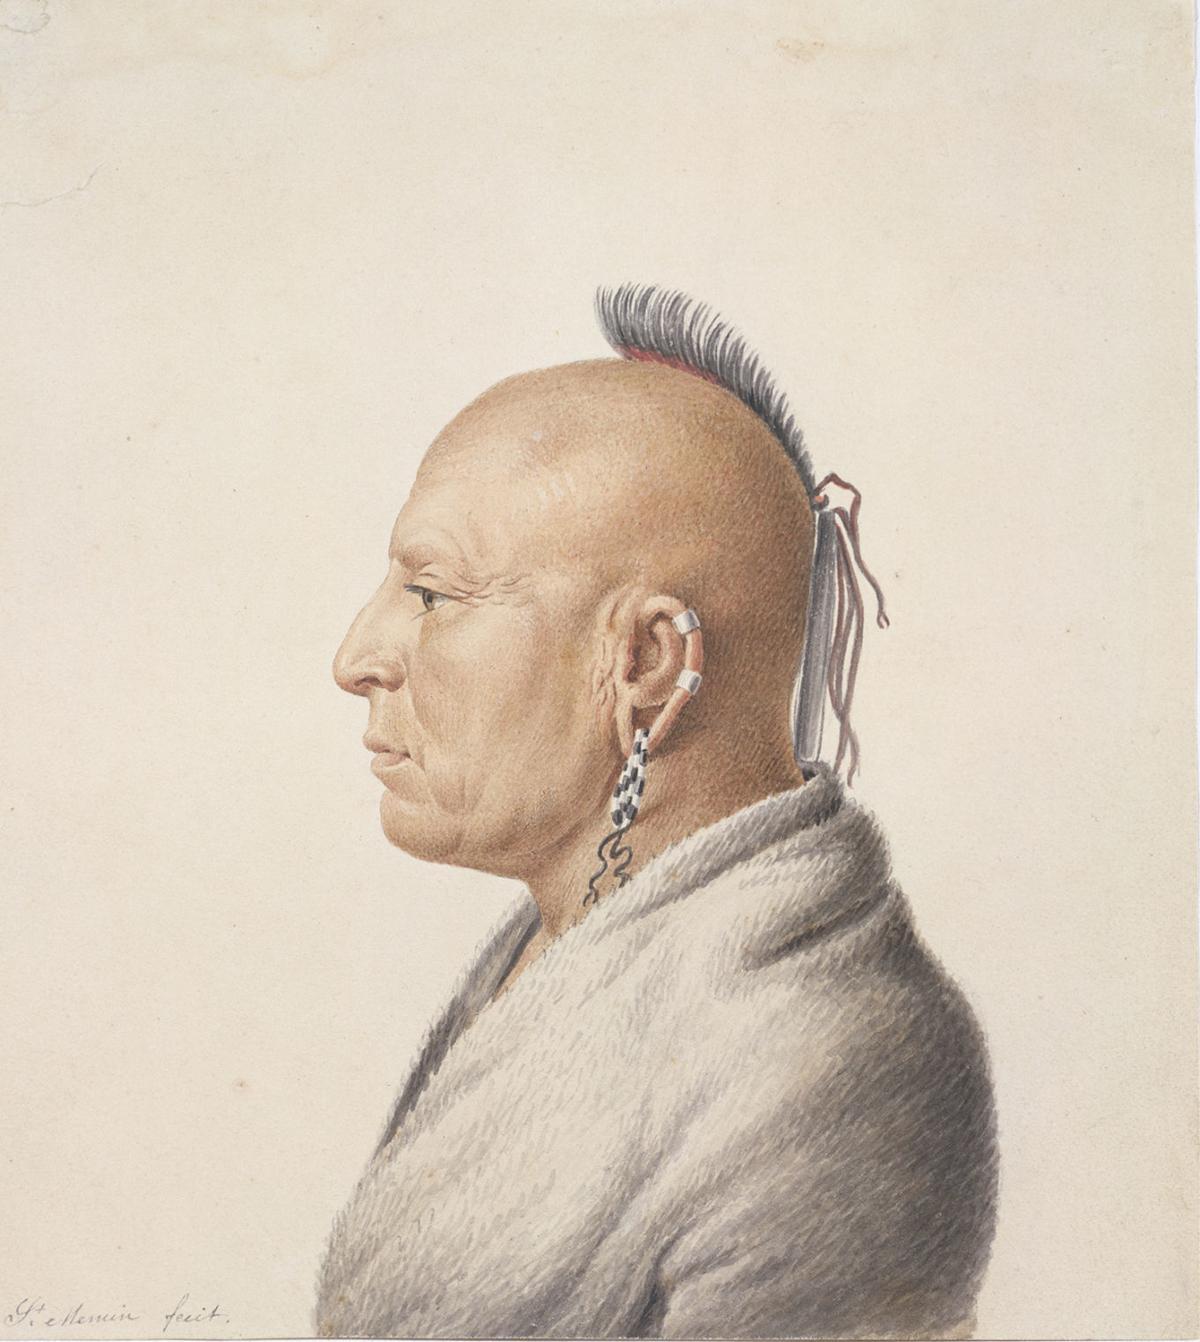 Travel Native American Art Exhibit